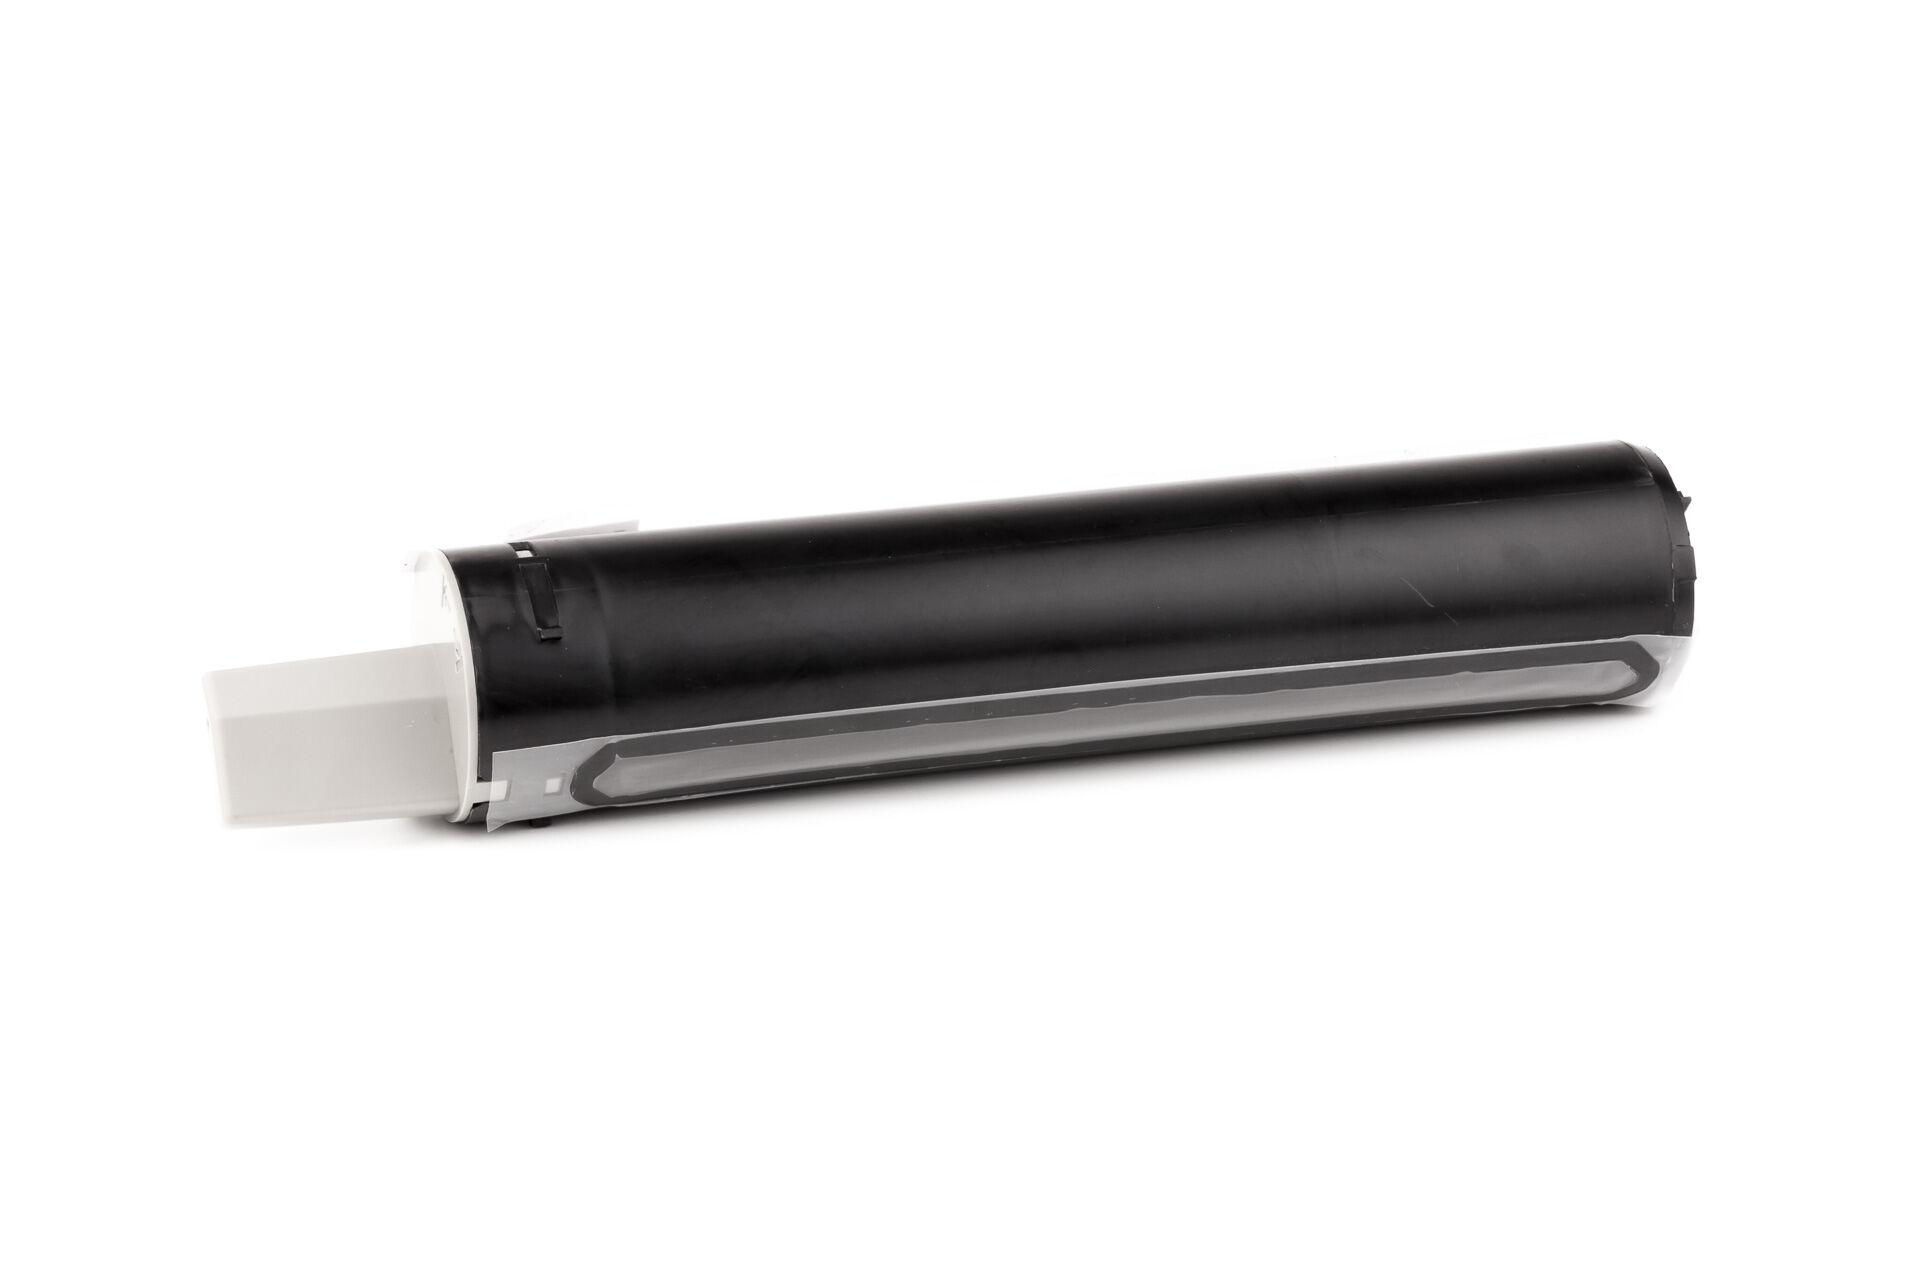 Canon Cartouche de Toner pour Canon 1382A002 / NPG-11 noir compatible (de marque ASC)